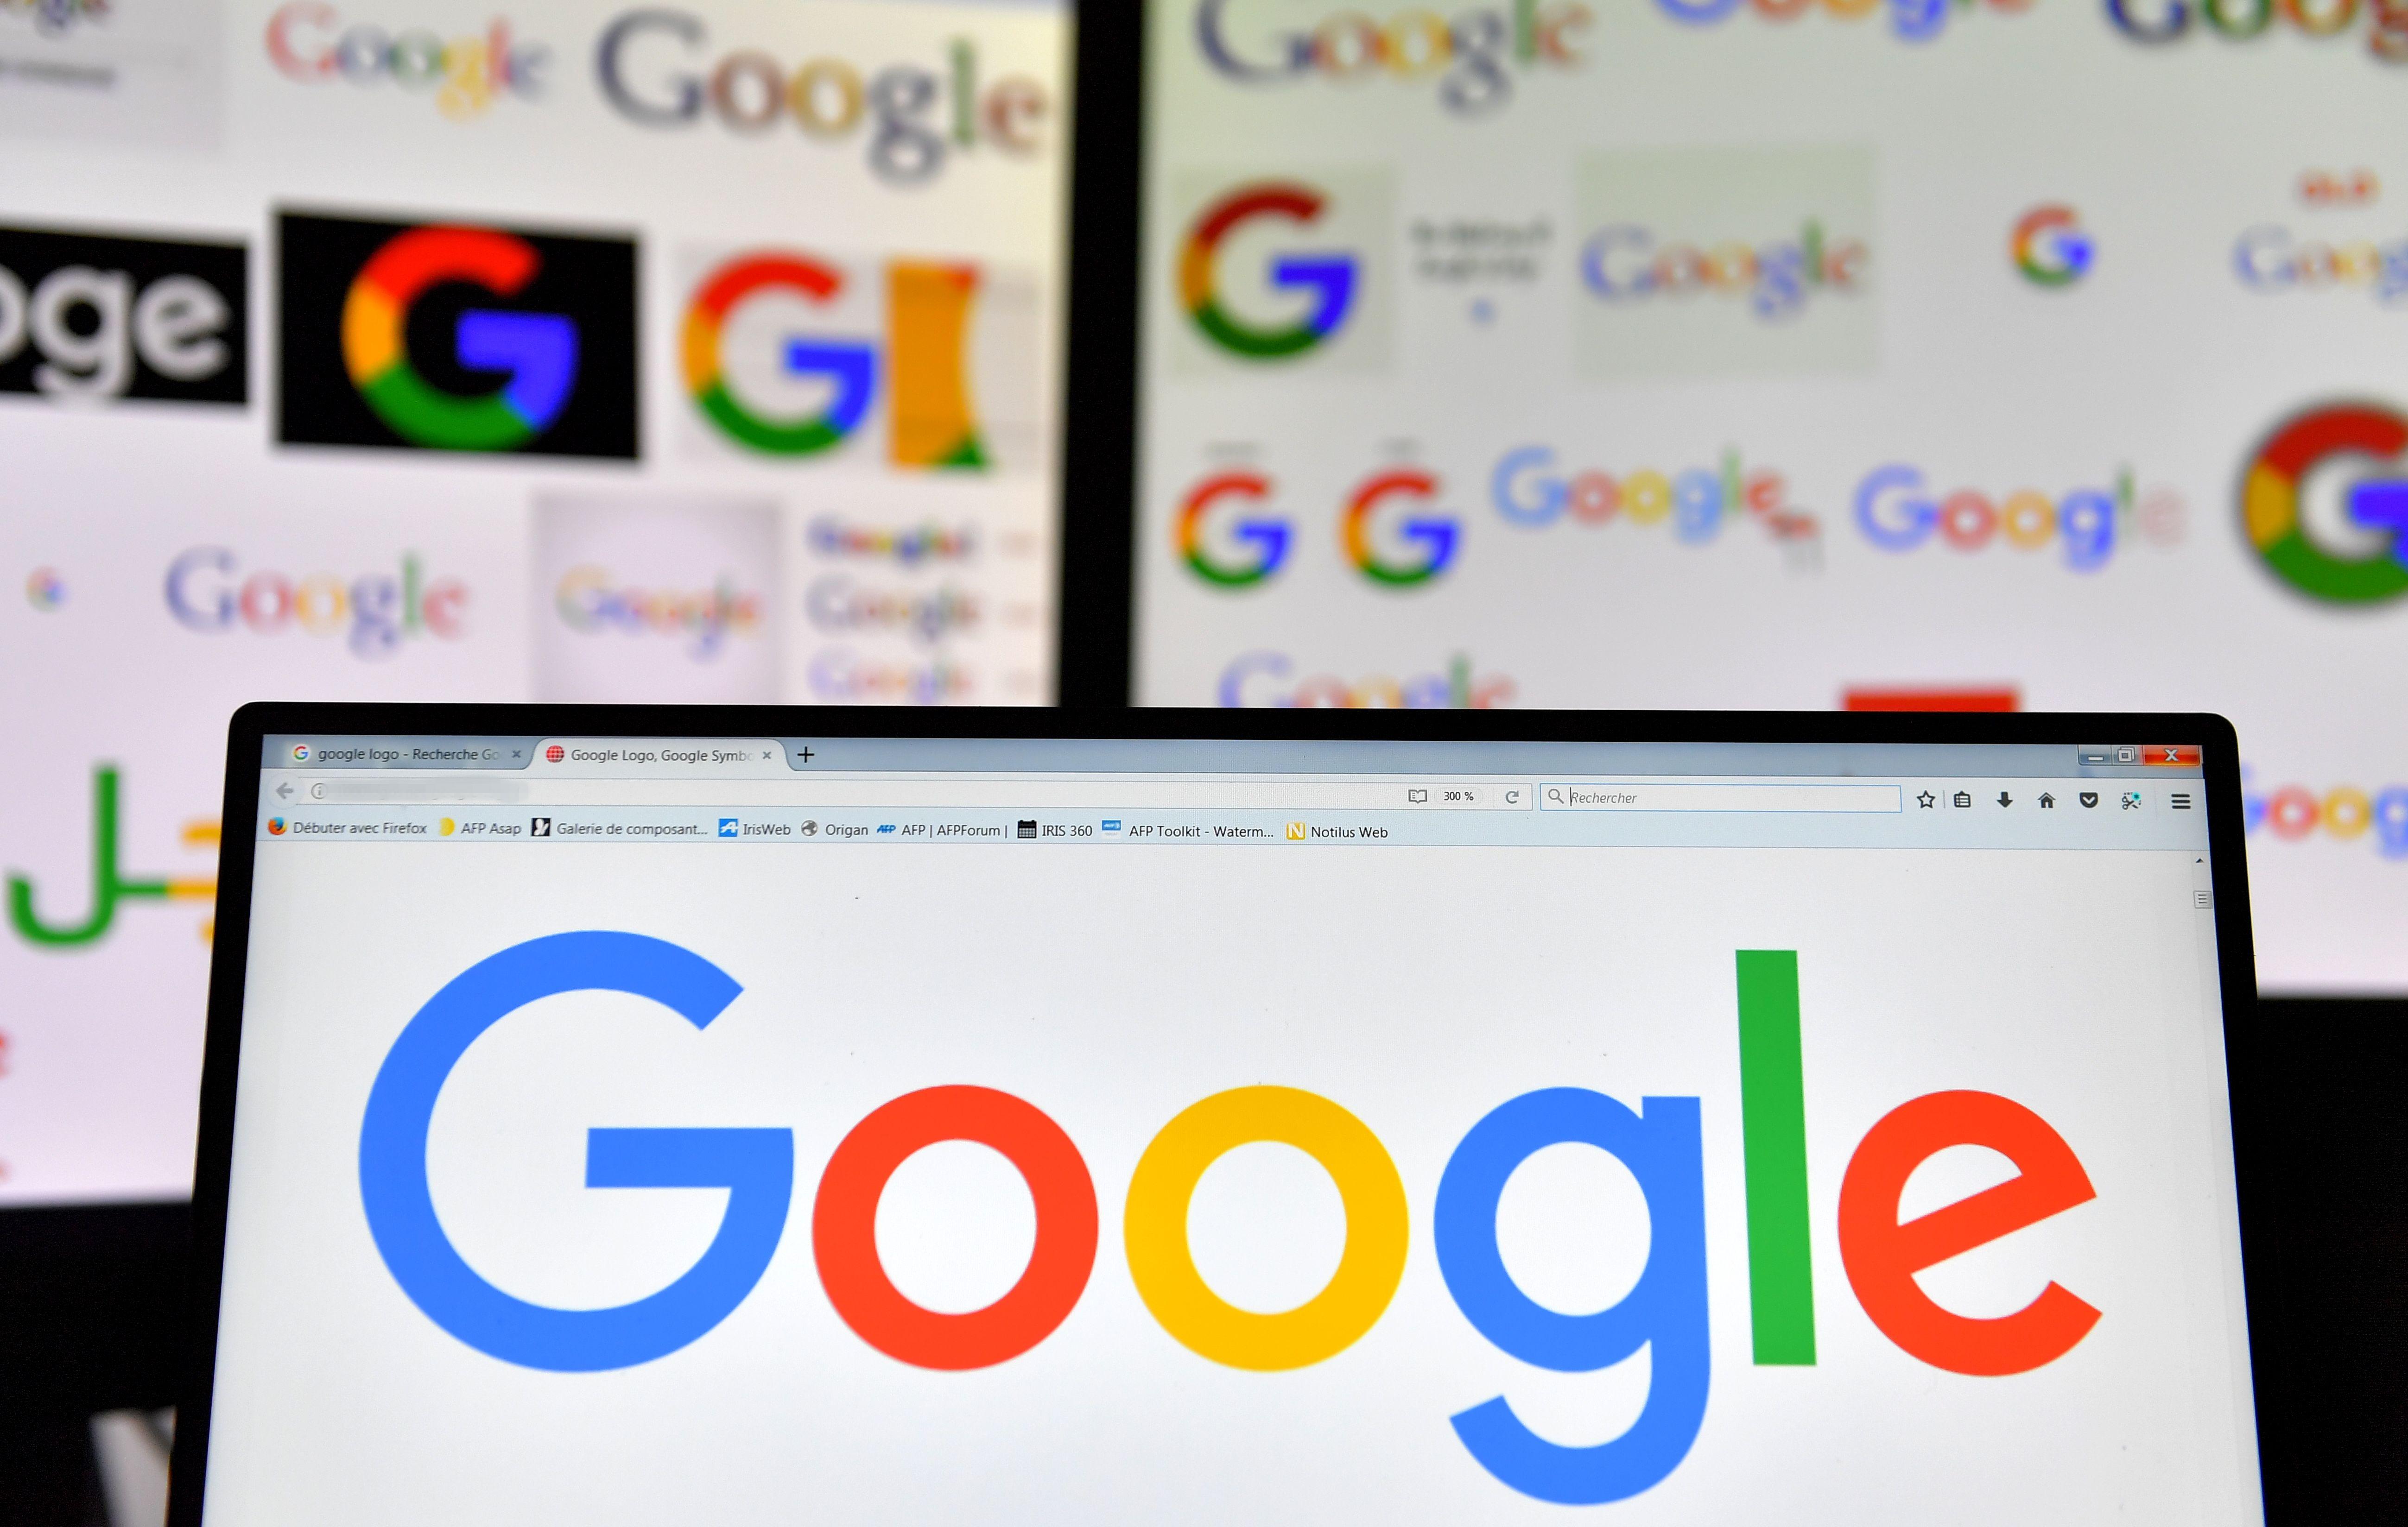 Google's logo is seen displayed on computer screens.